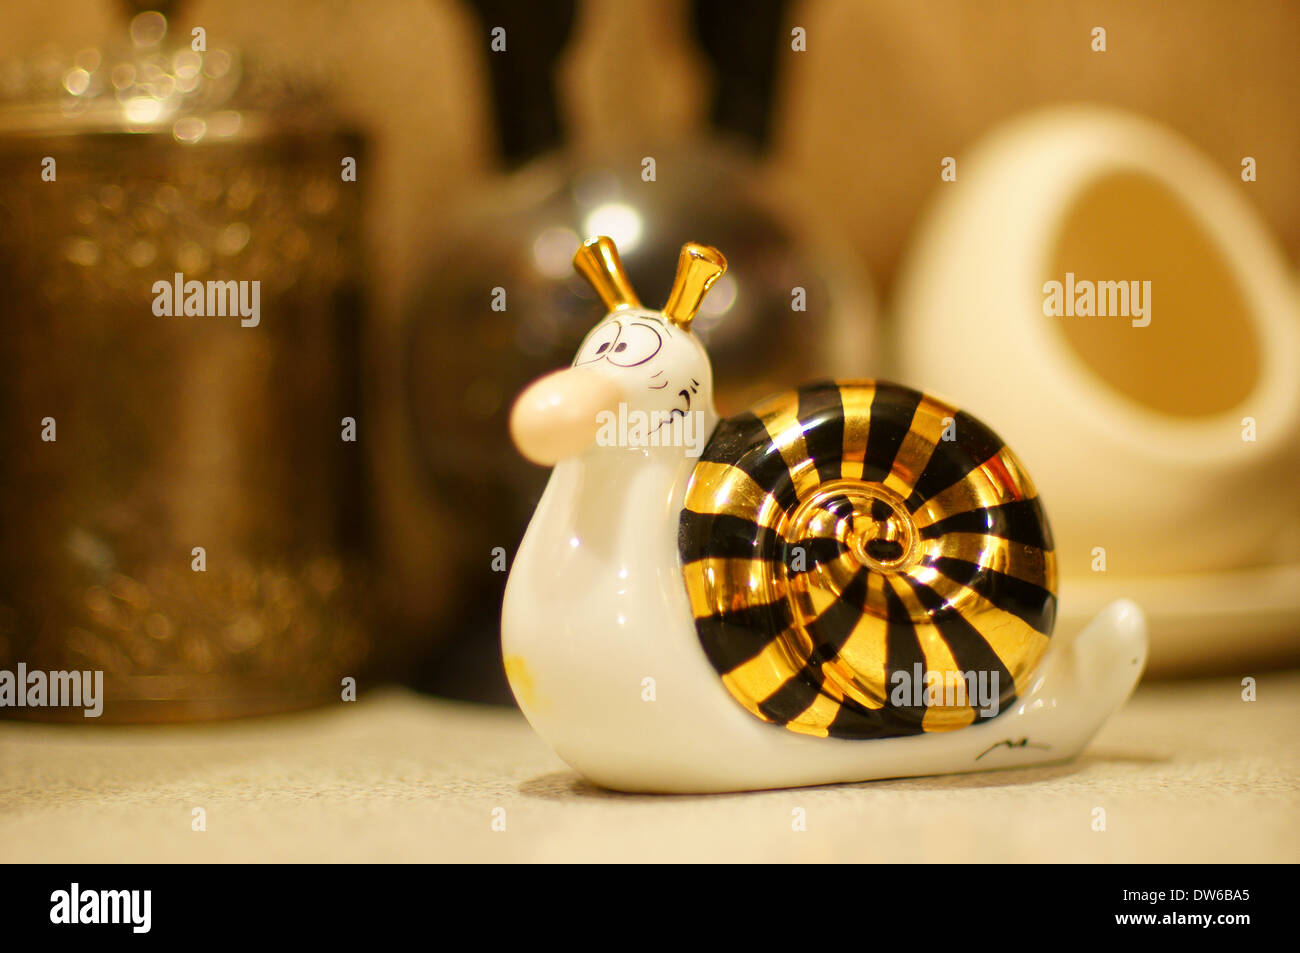 Figurine of snail salt cellar - Stock Image